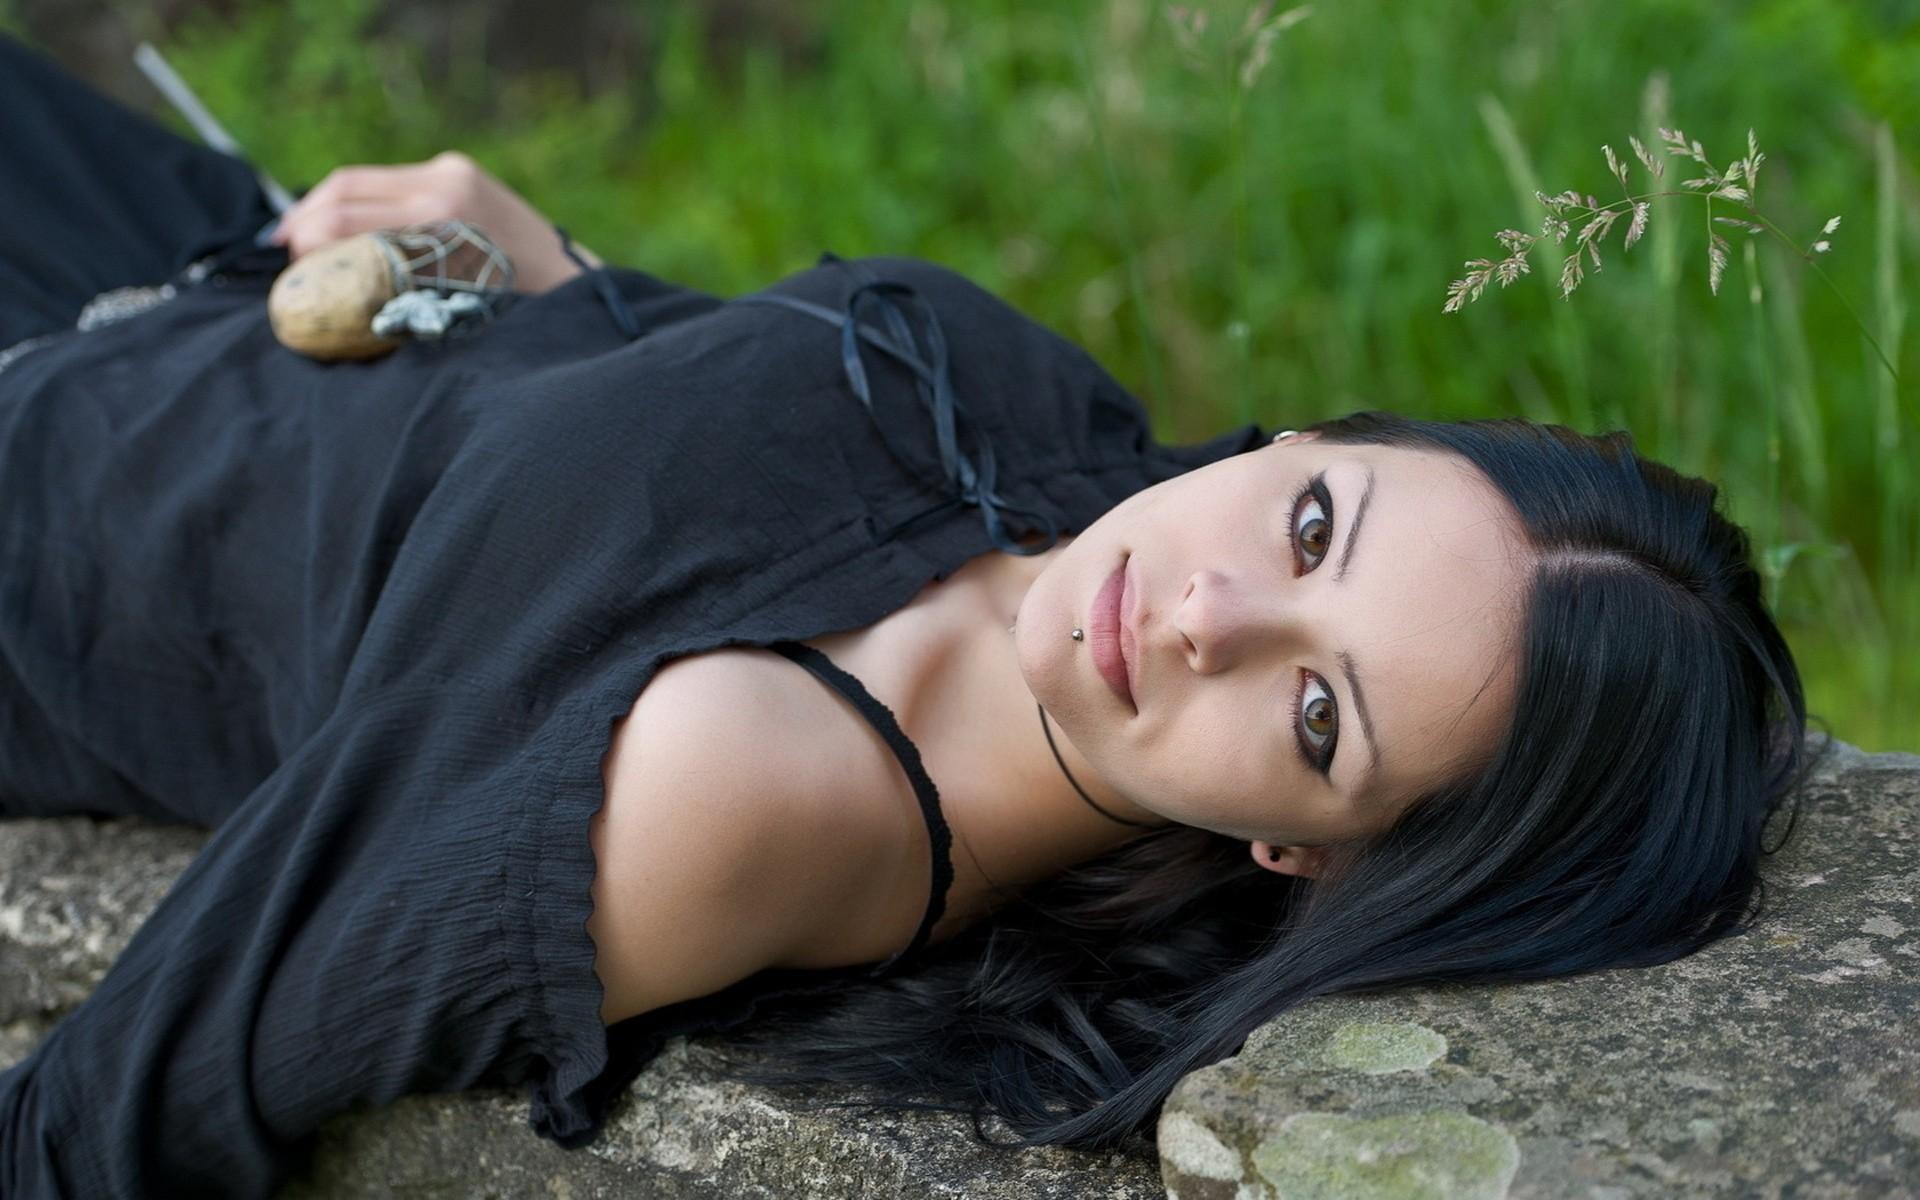 People 1920x1200 women model long hair women outdoors grass dark hair black dress piercing